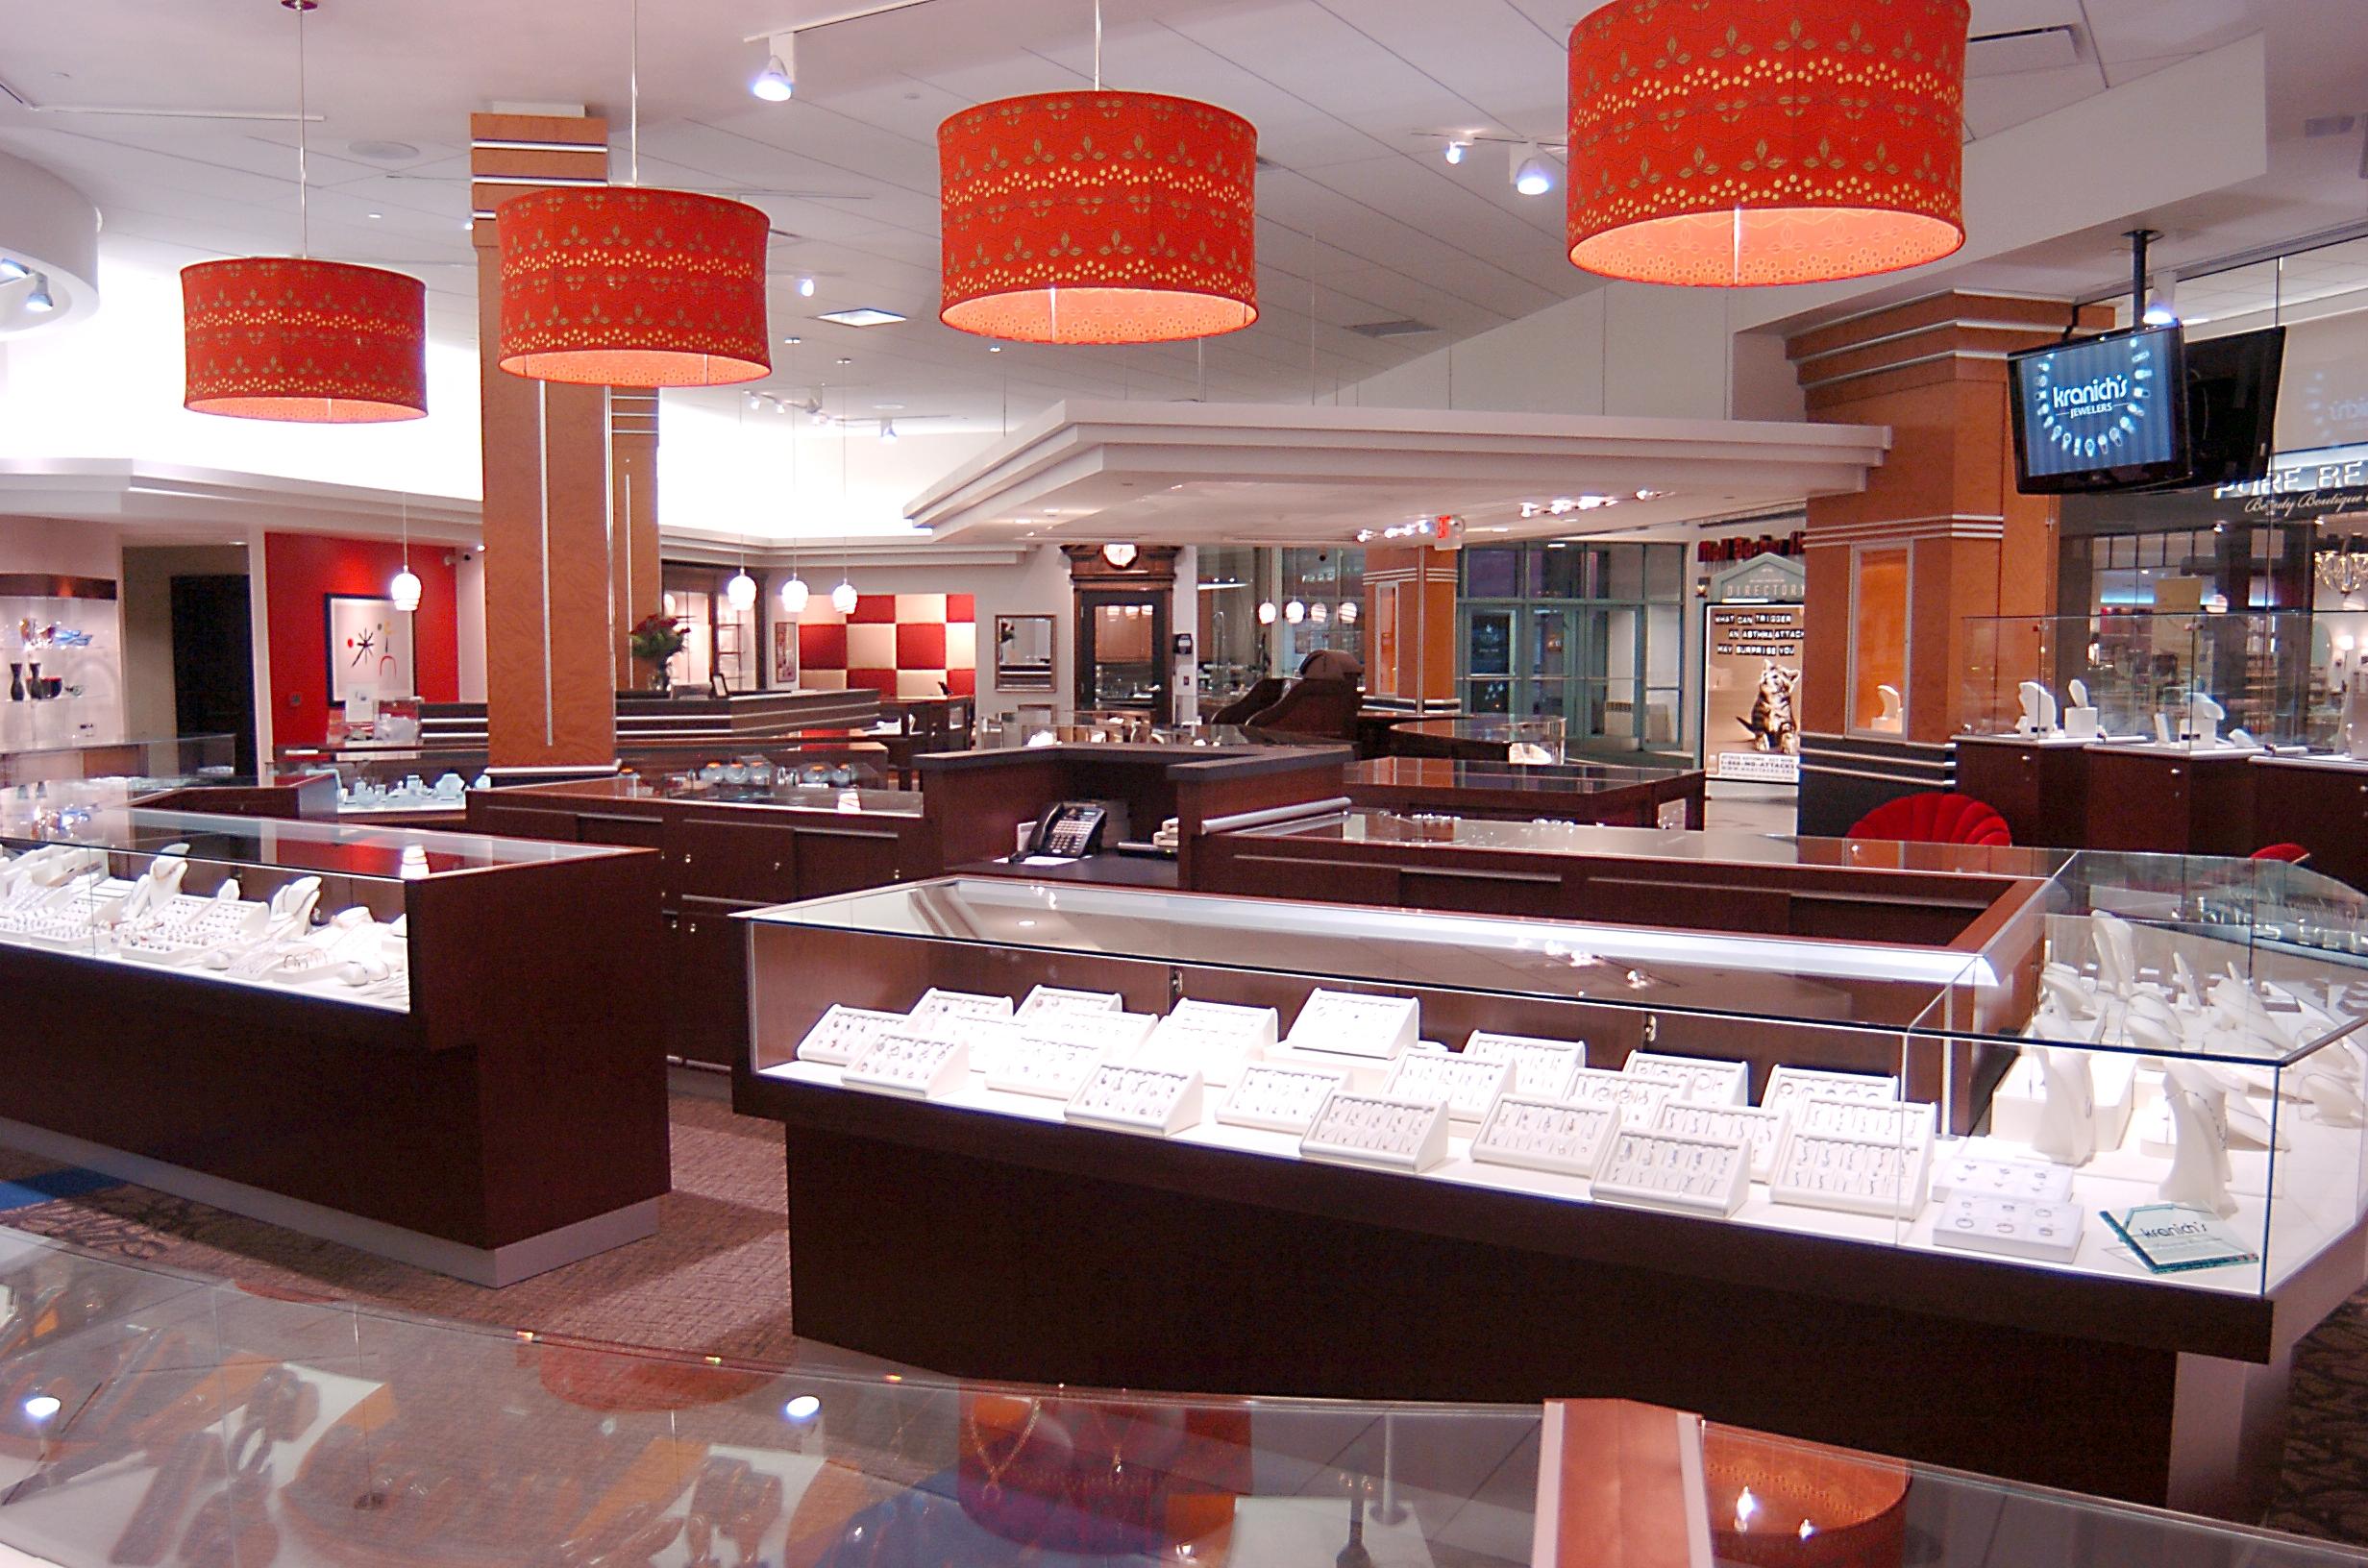 interior to mall.JPG